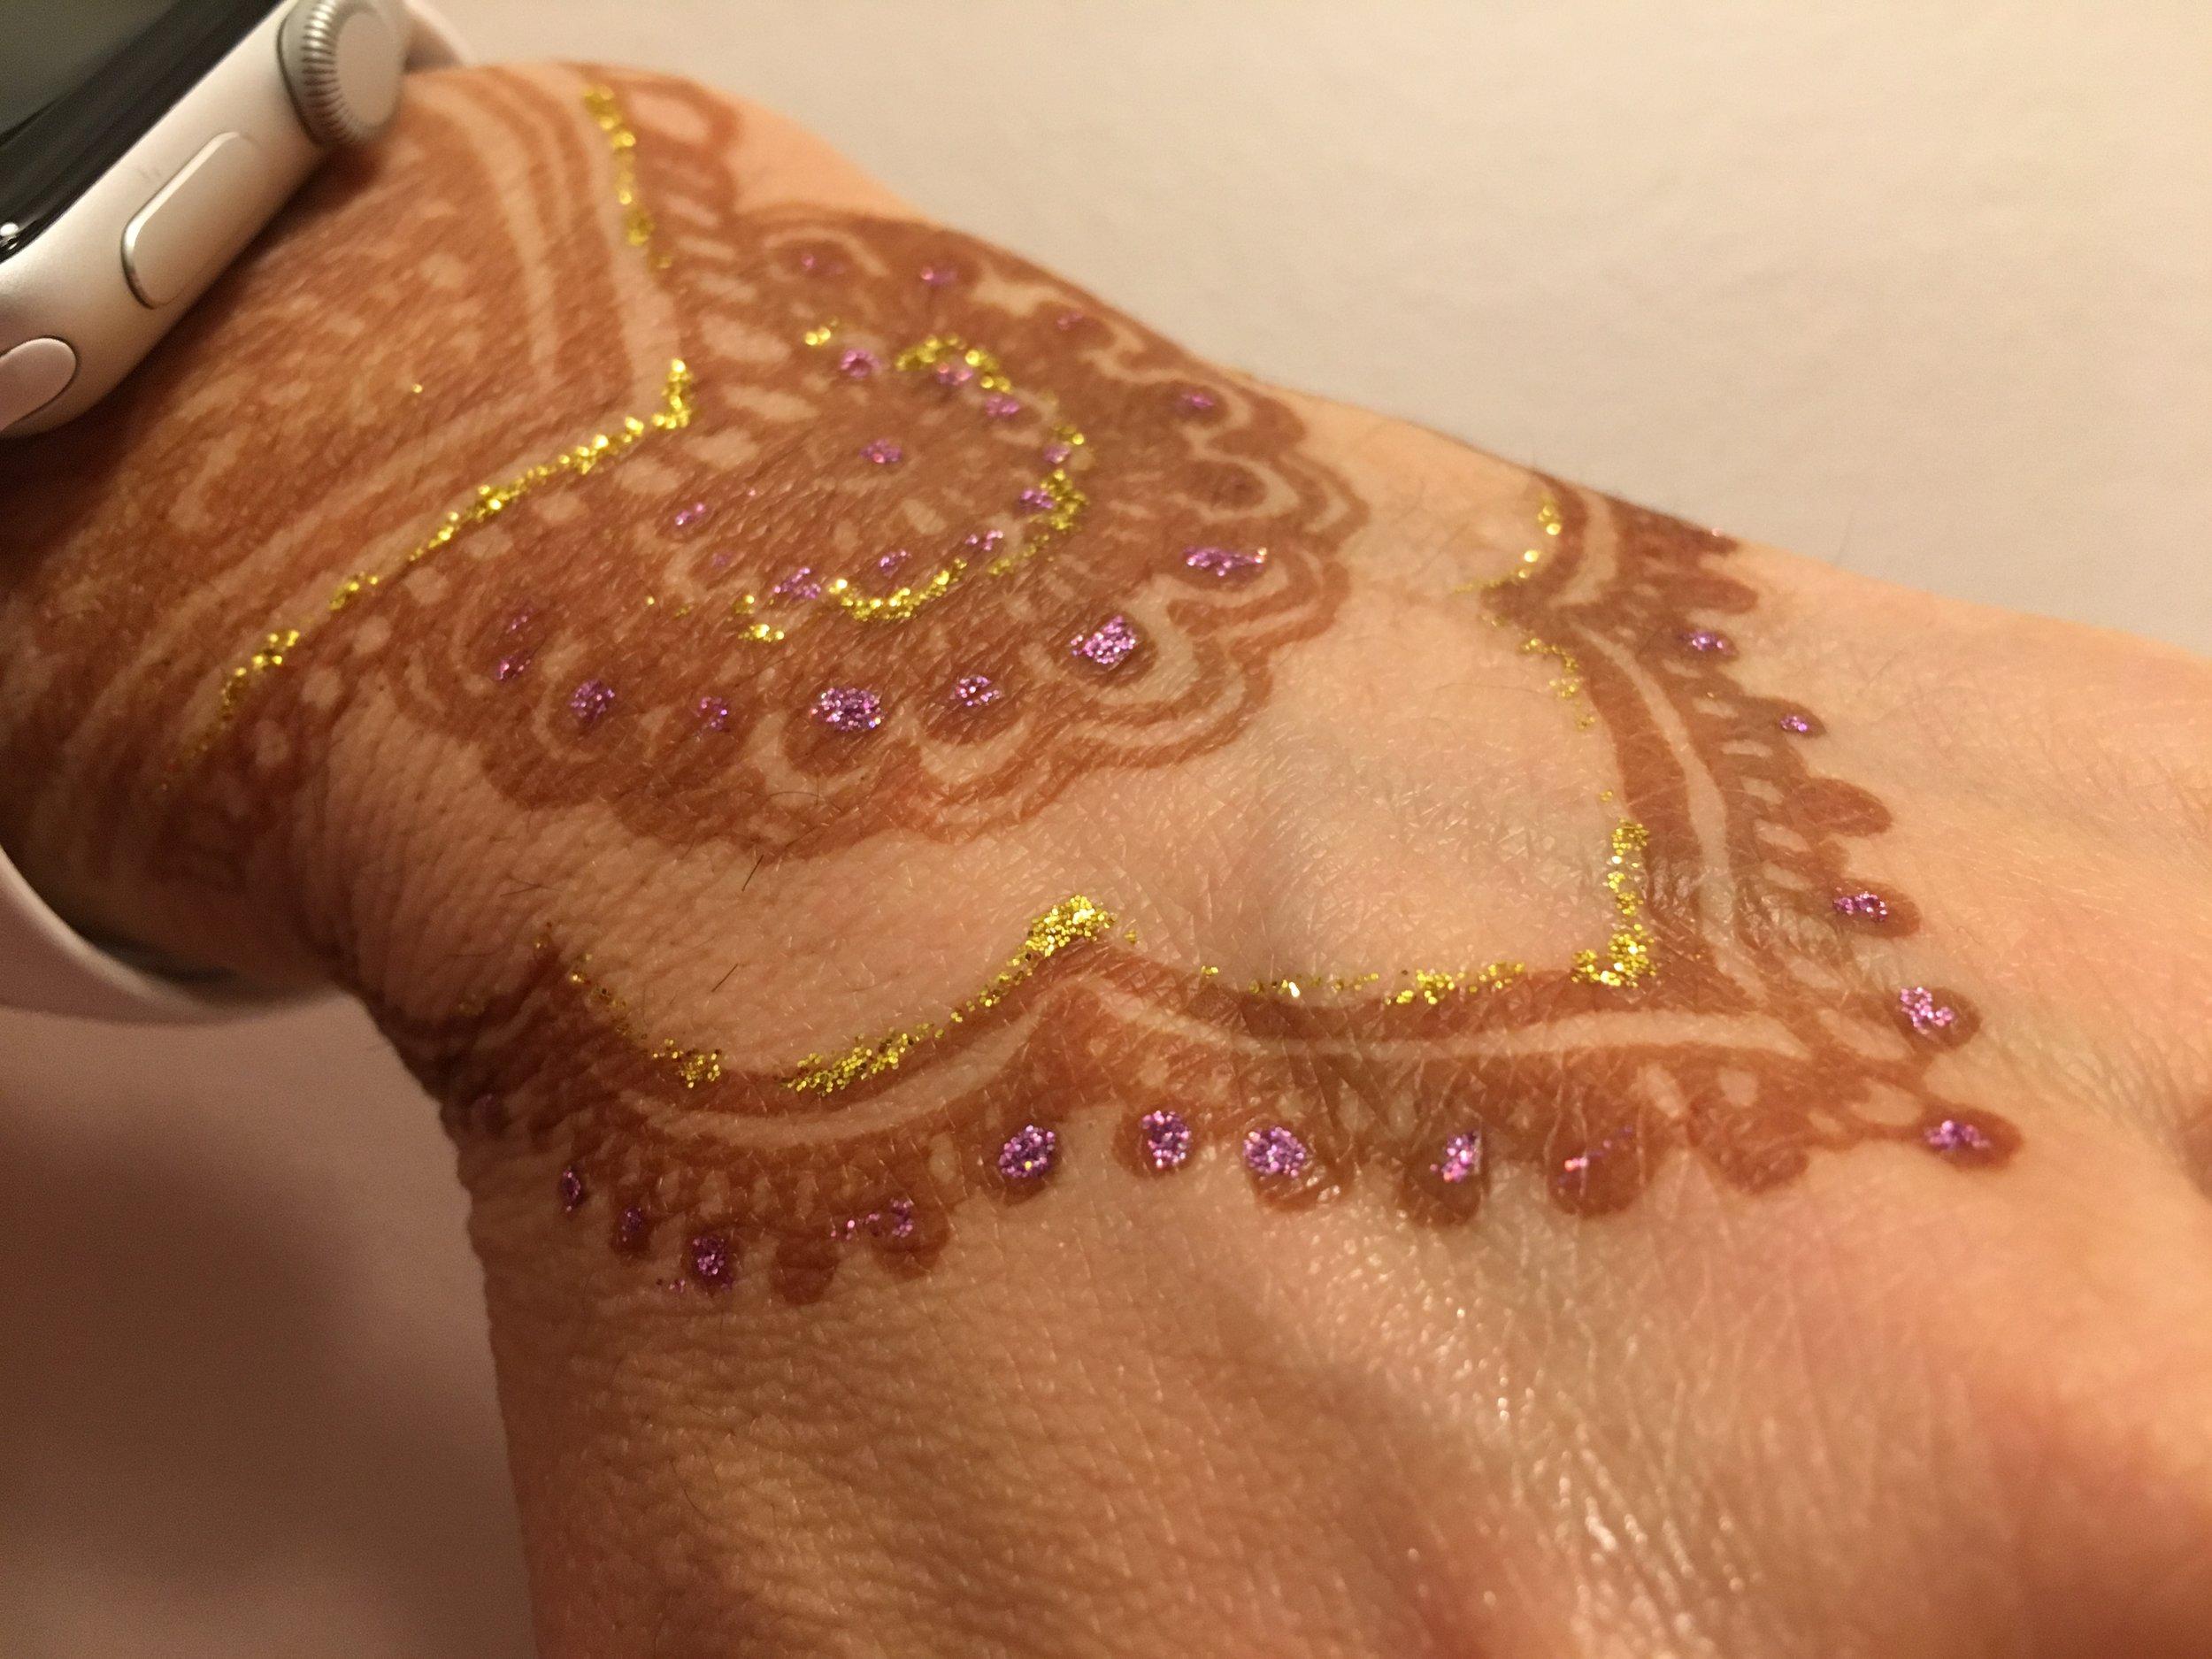 One day old henna still developing